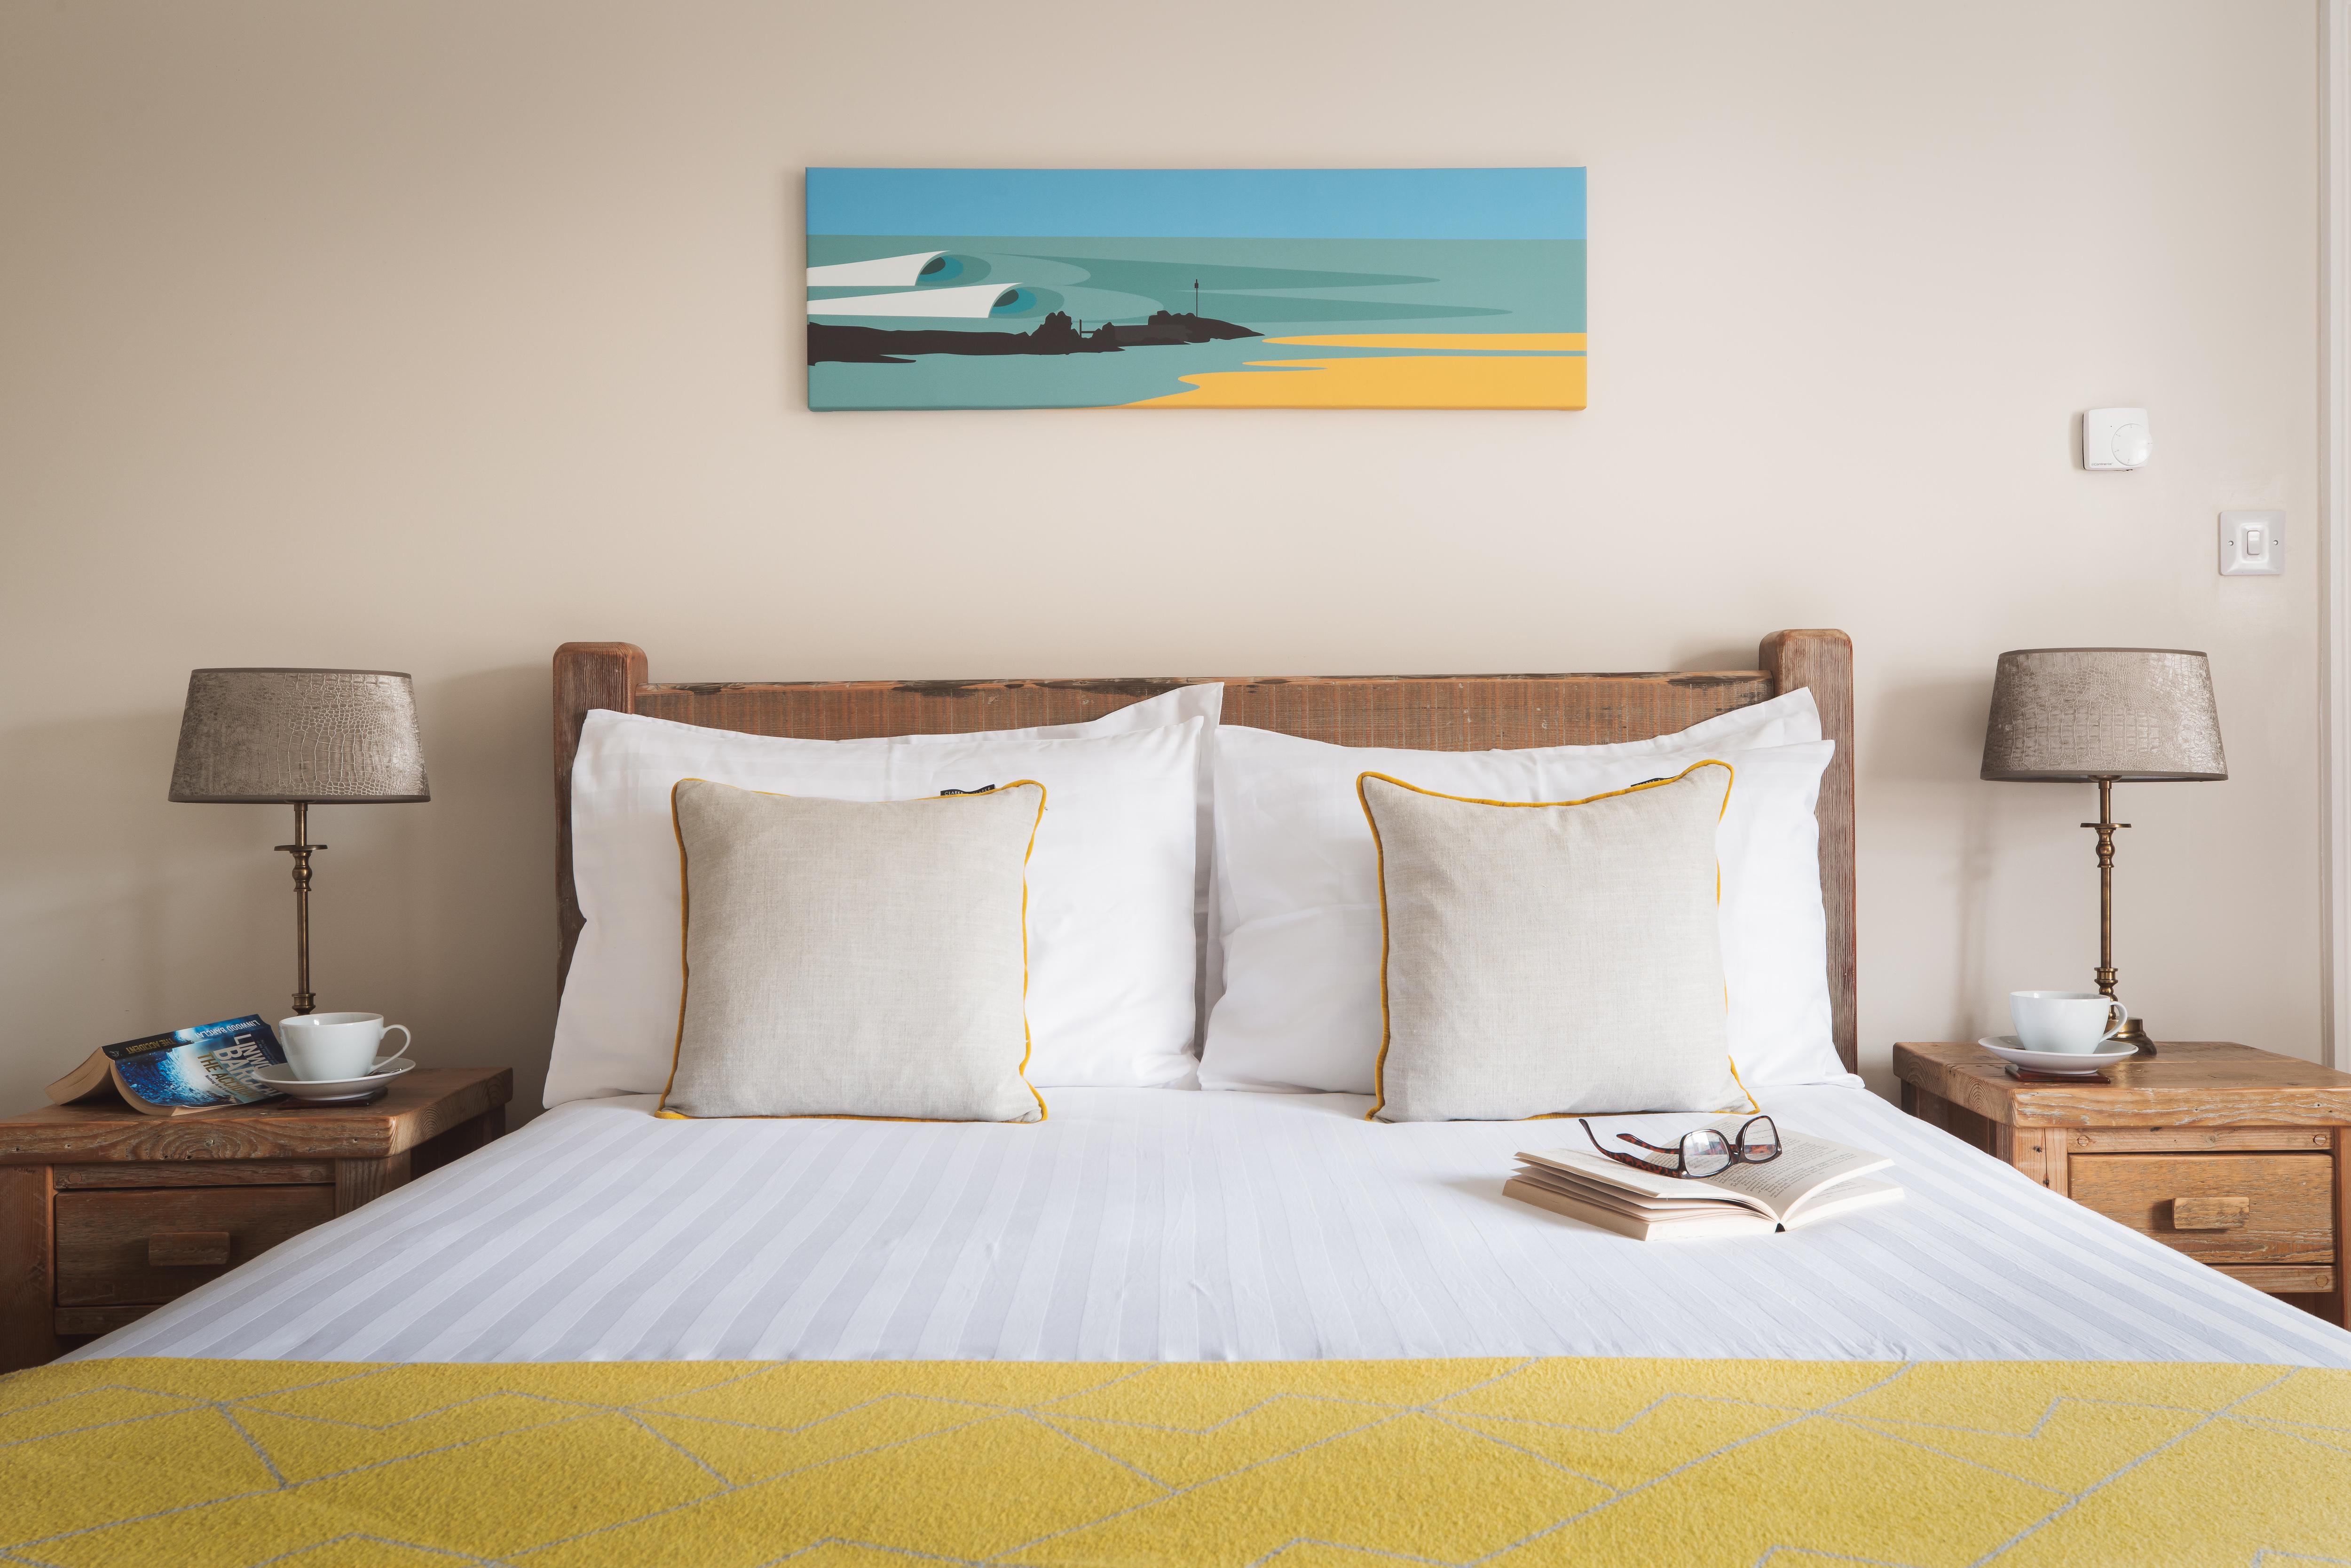 King size en-suite bedroom at award winning Gwelmor in Widemouth Bay